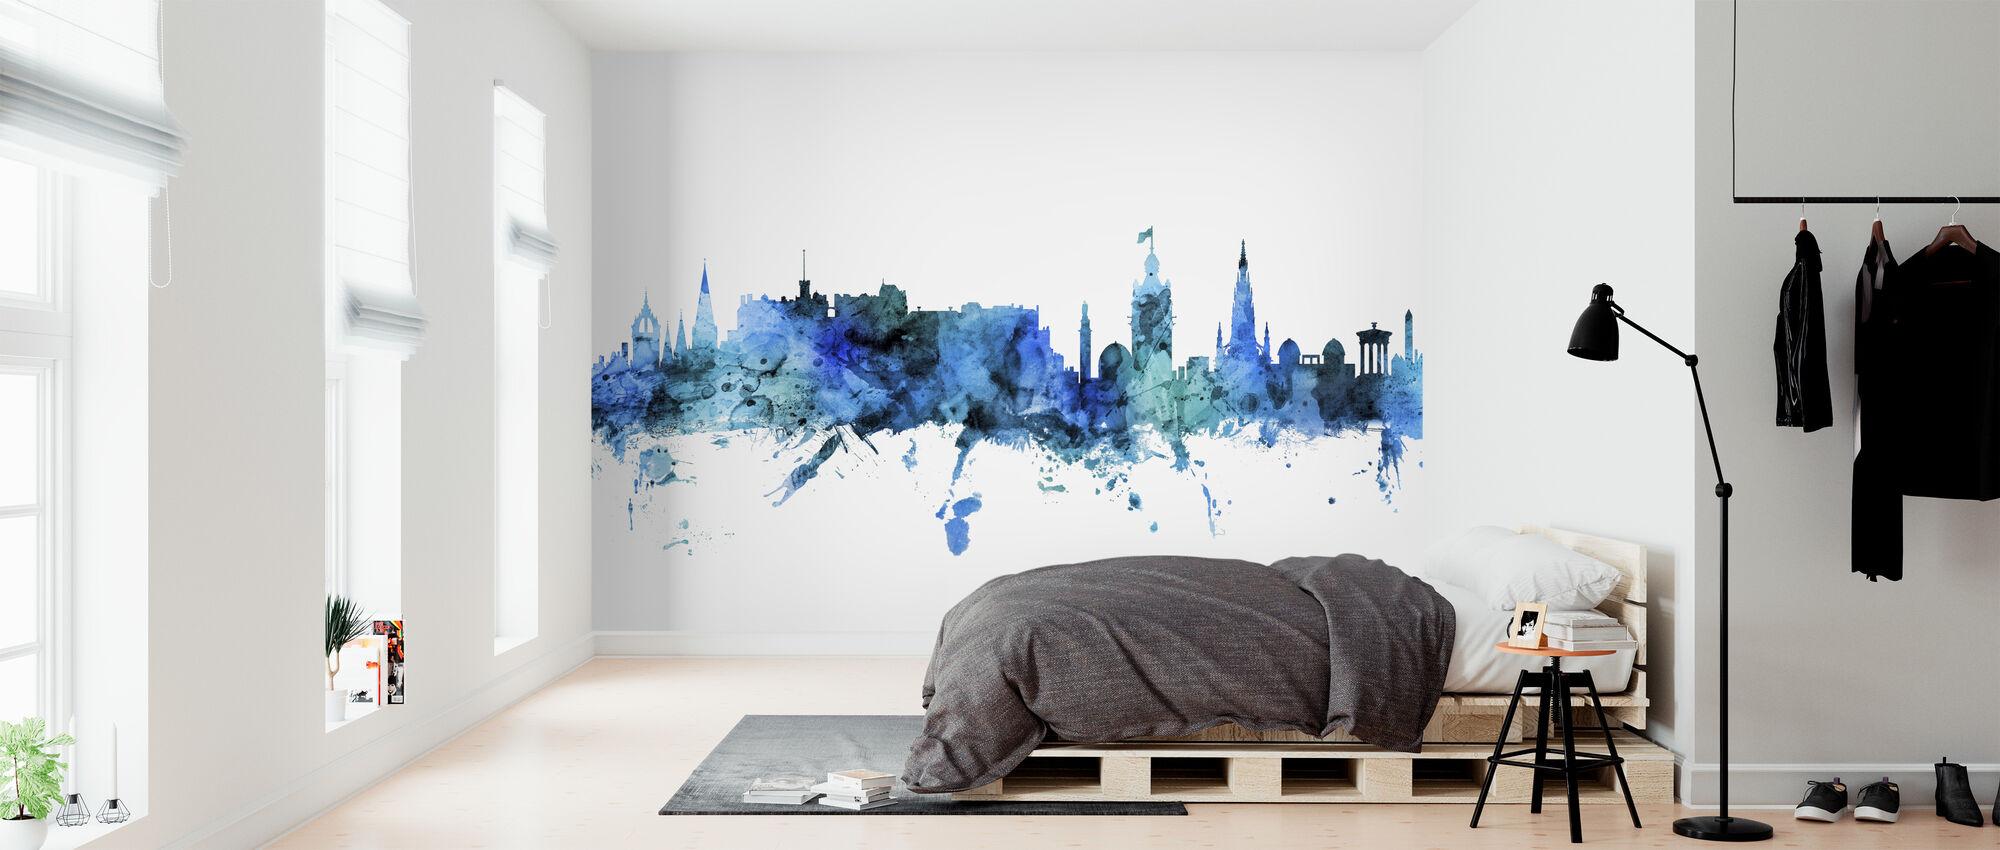 Edinburgh Scotland Skyline - Wallpaper - Bedroom